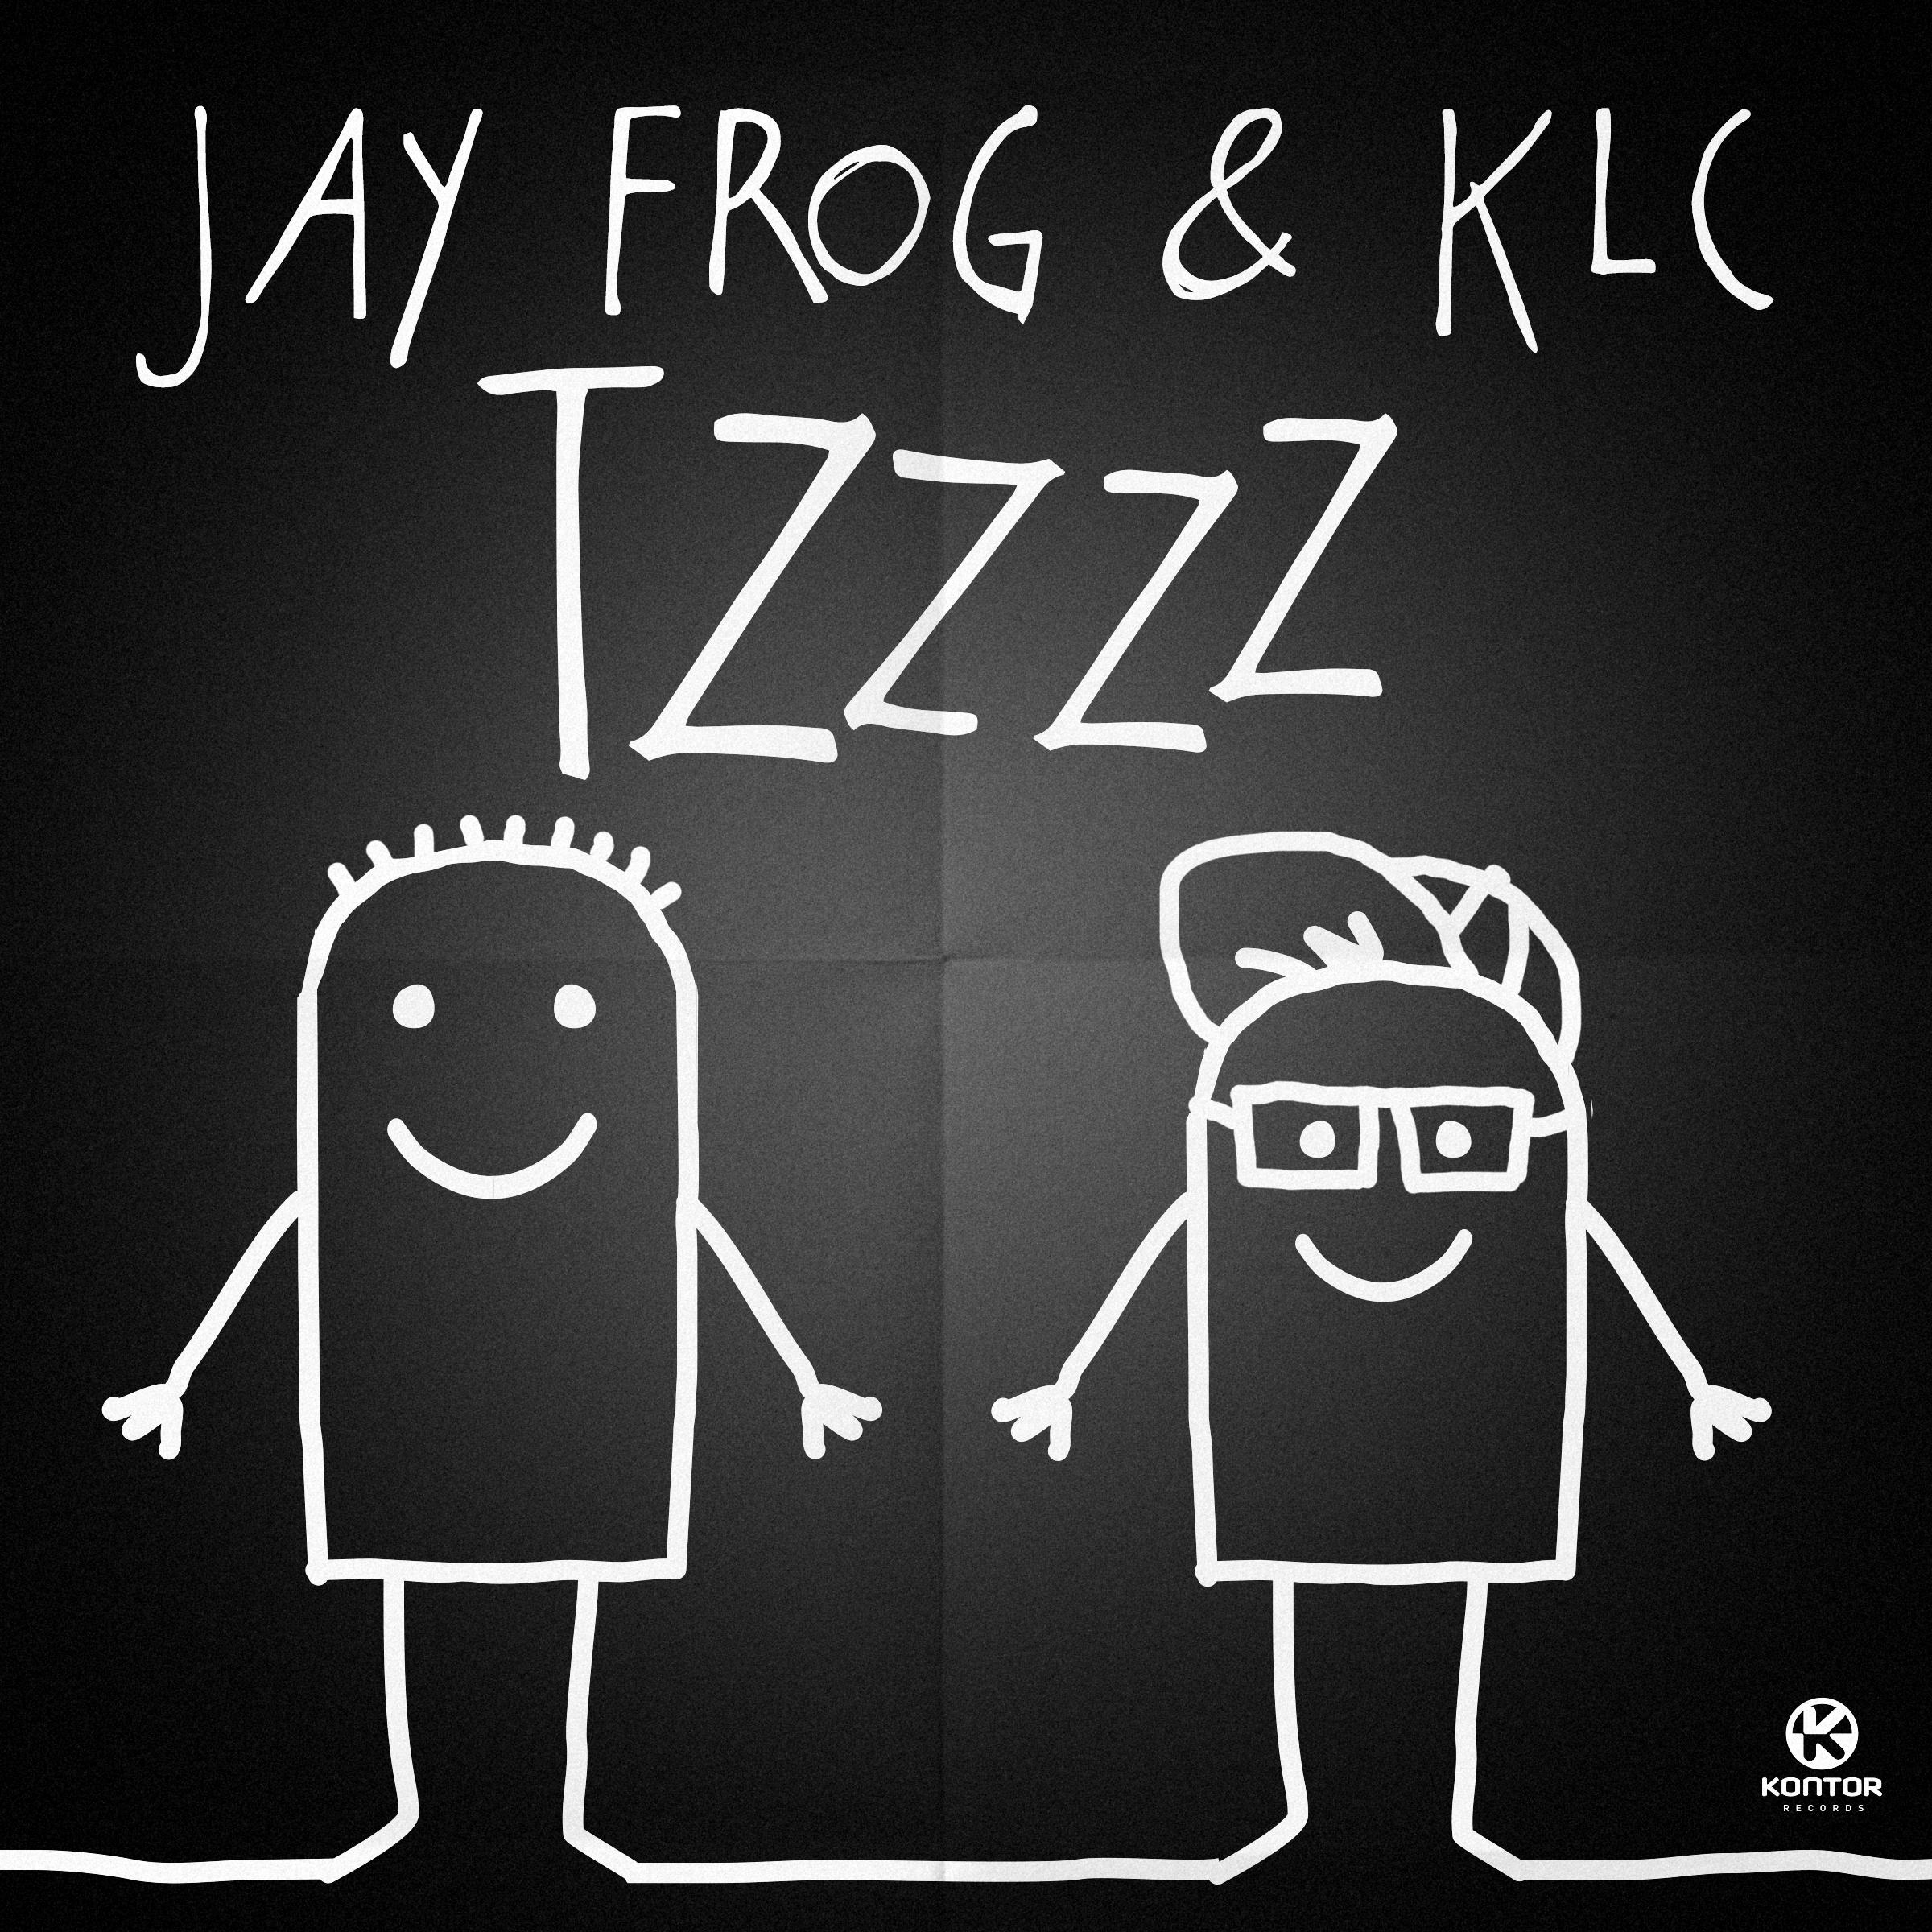 JAY FROG & KLC - Tzzzz (Kontor/Kontor New Media)